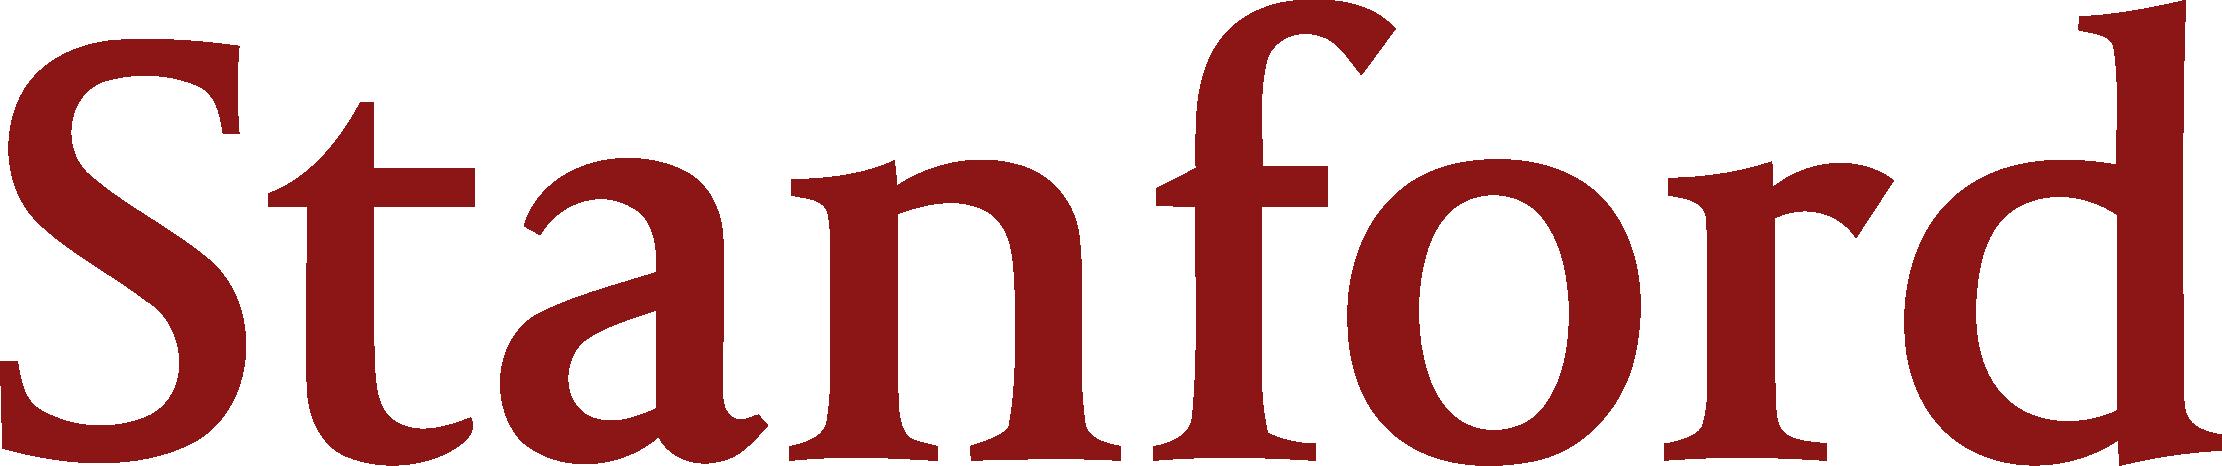 Stanford-university_logo - Stanford University Logo Vector PNG